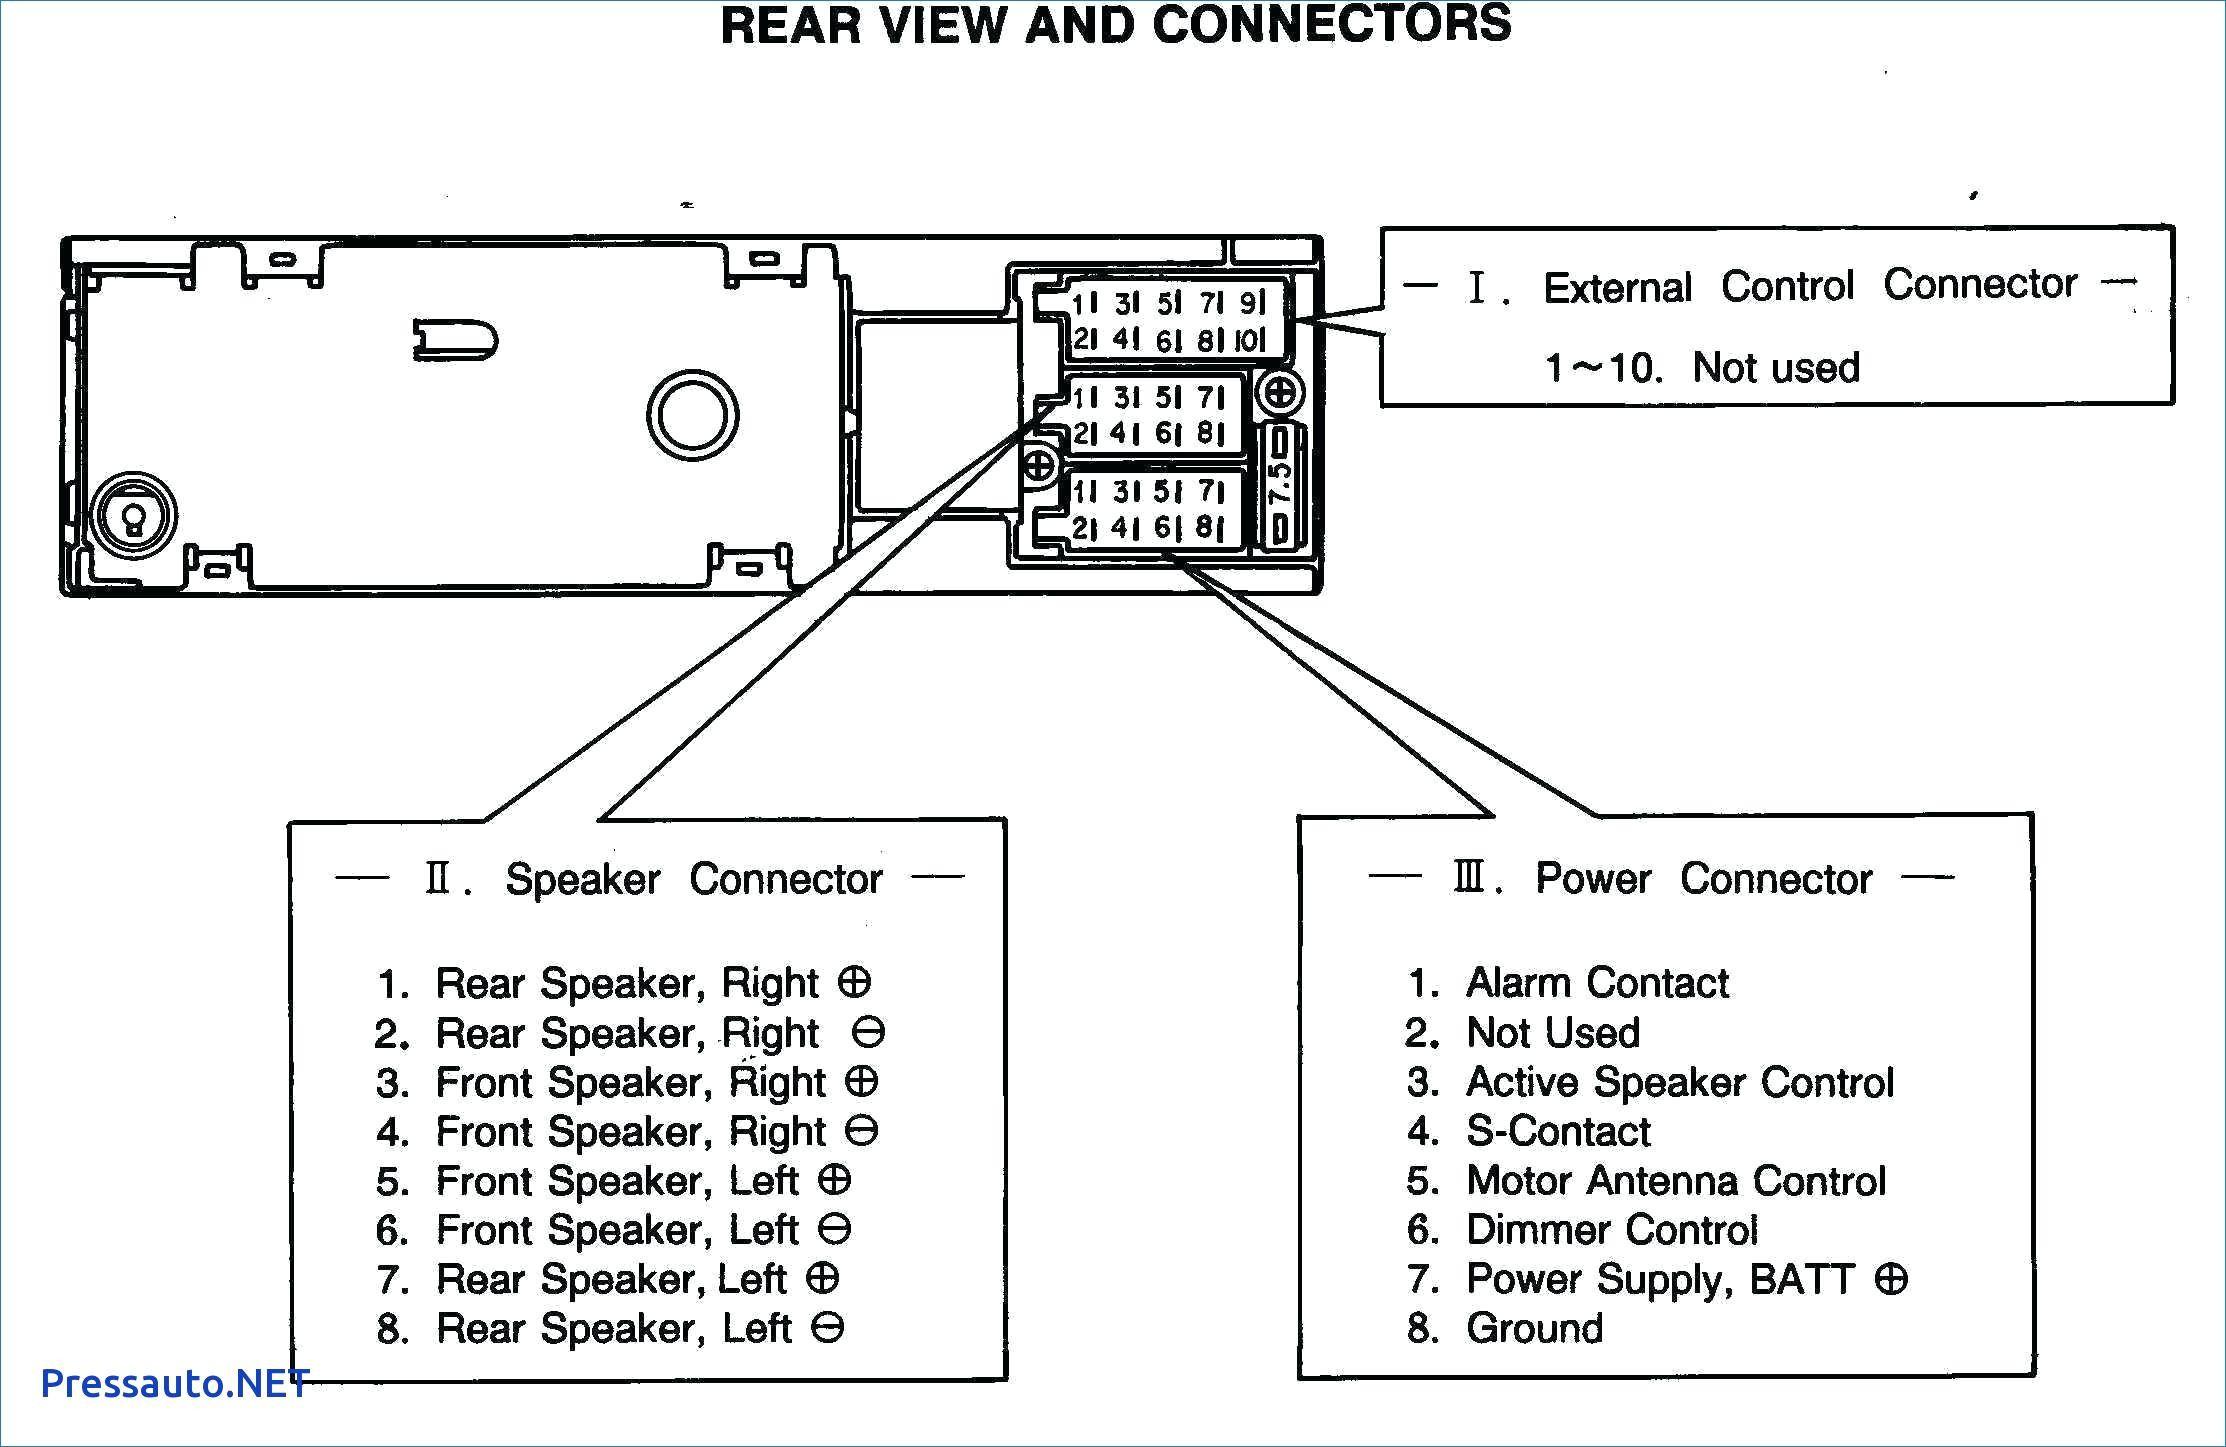 2004 Jeep Grand Cherokee Engine Diagram Kia Spectra Wiring Starter 2003 Sensor Forum